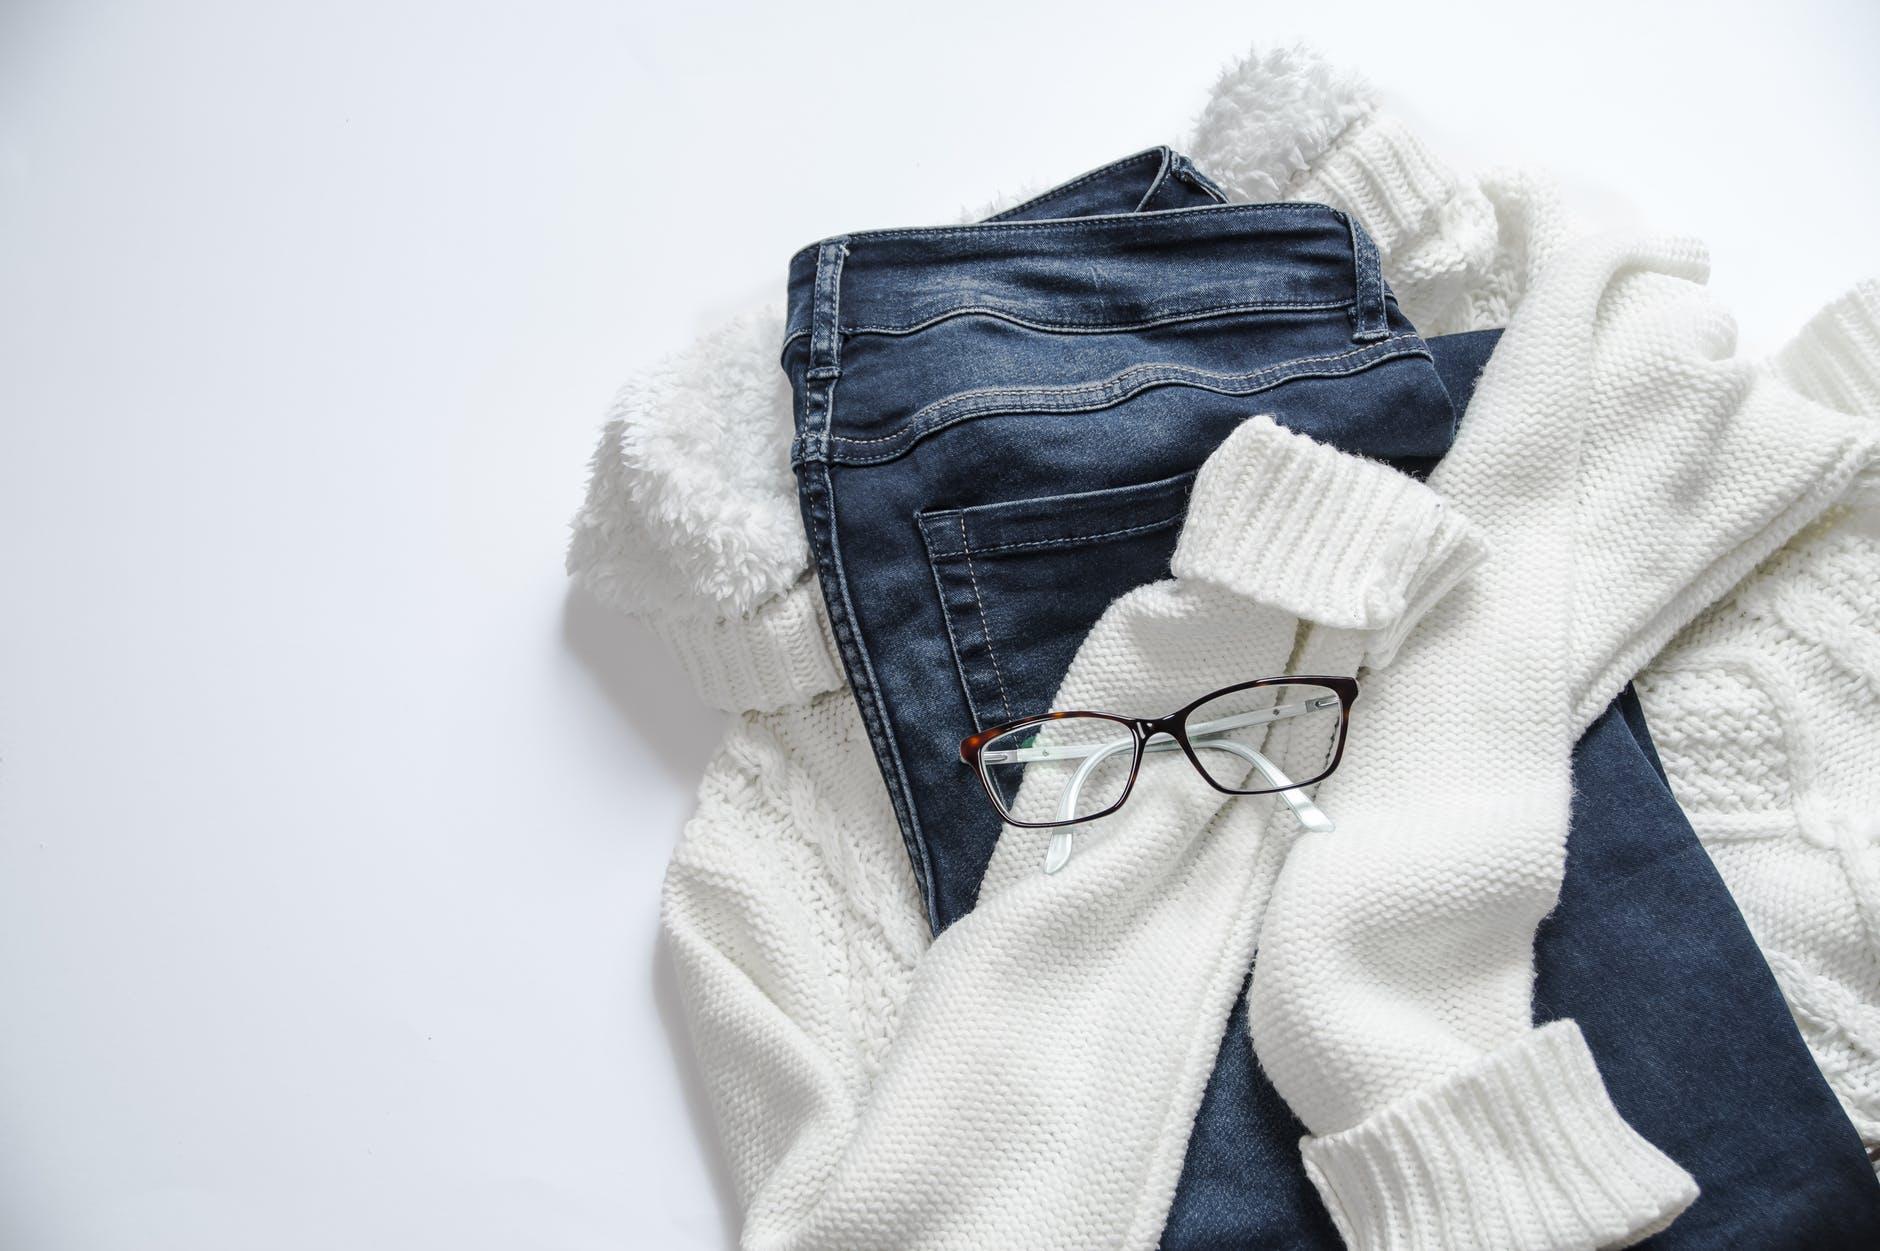 black framed eyeglasses on white jacket and blue denim bottoms